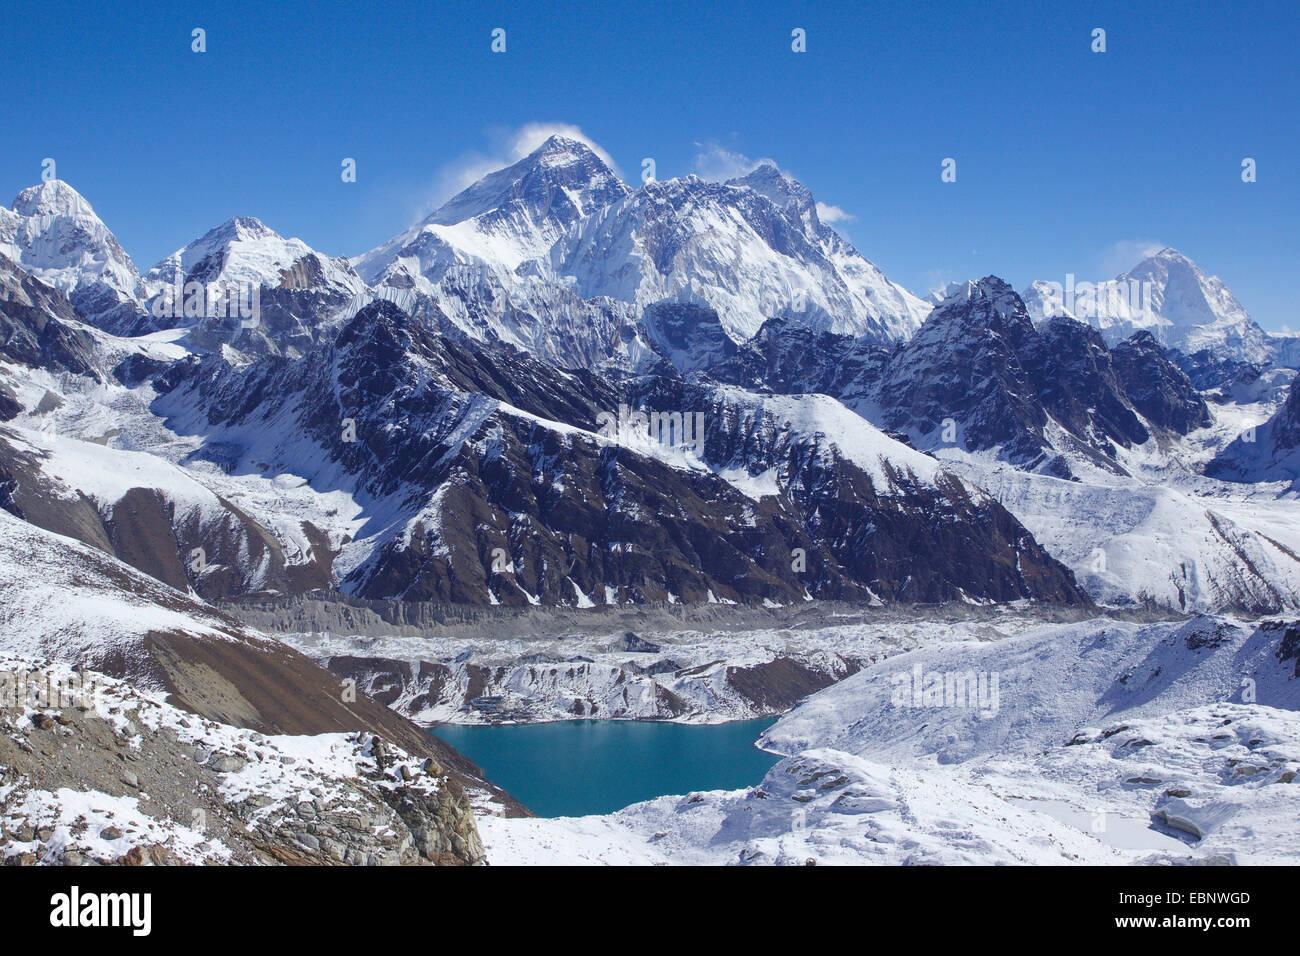 Mount Everest, Nuptse, Lhotse and Makalu, in front Lake of Gokyo. View from Renjo La, Nepal, Khumbu Himal - Stock Image